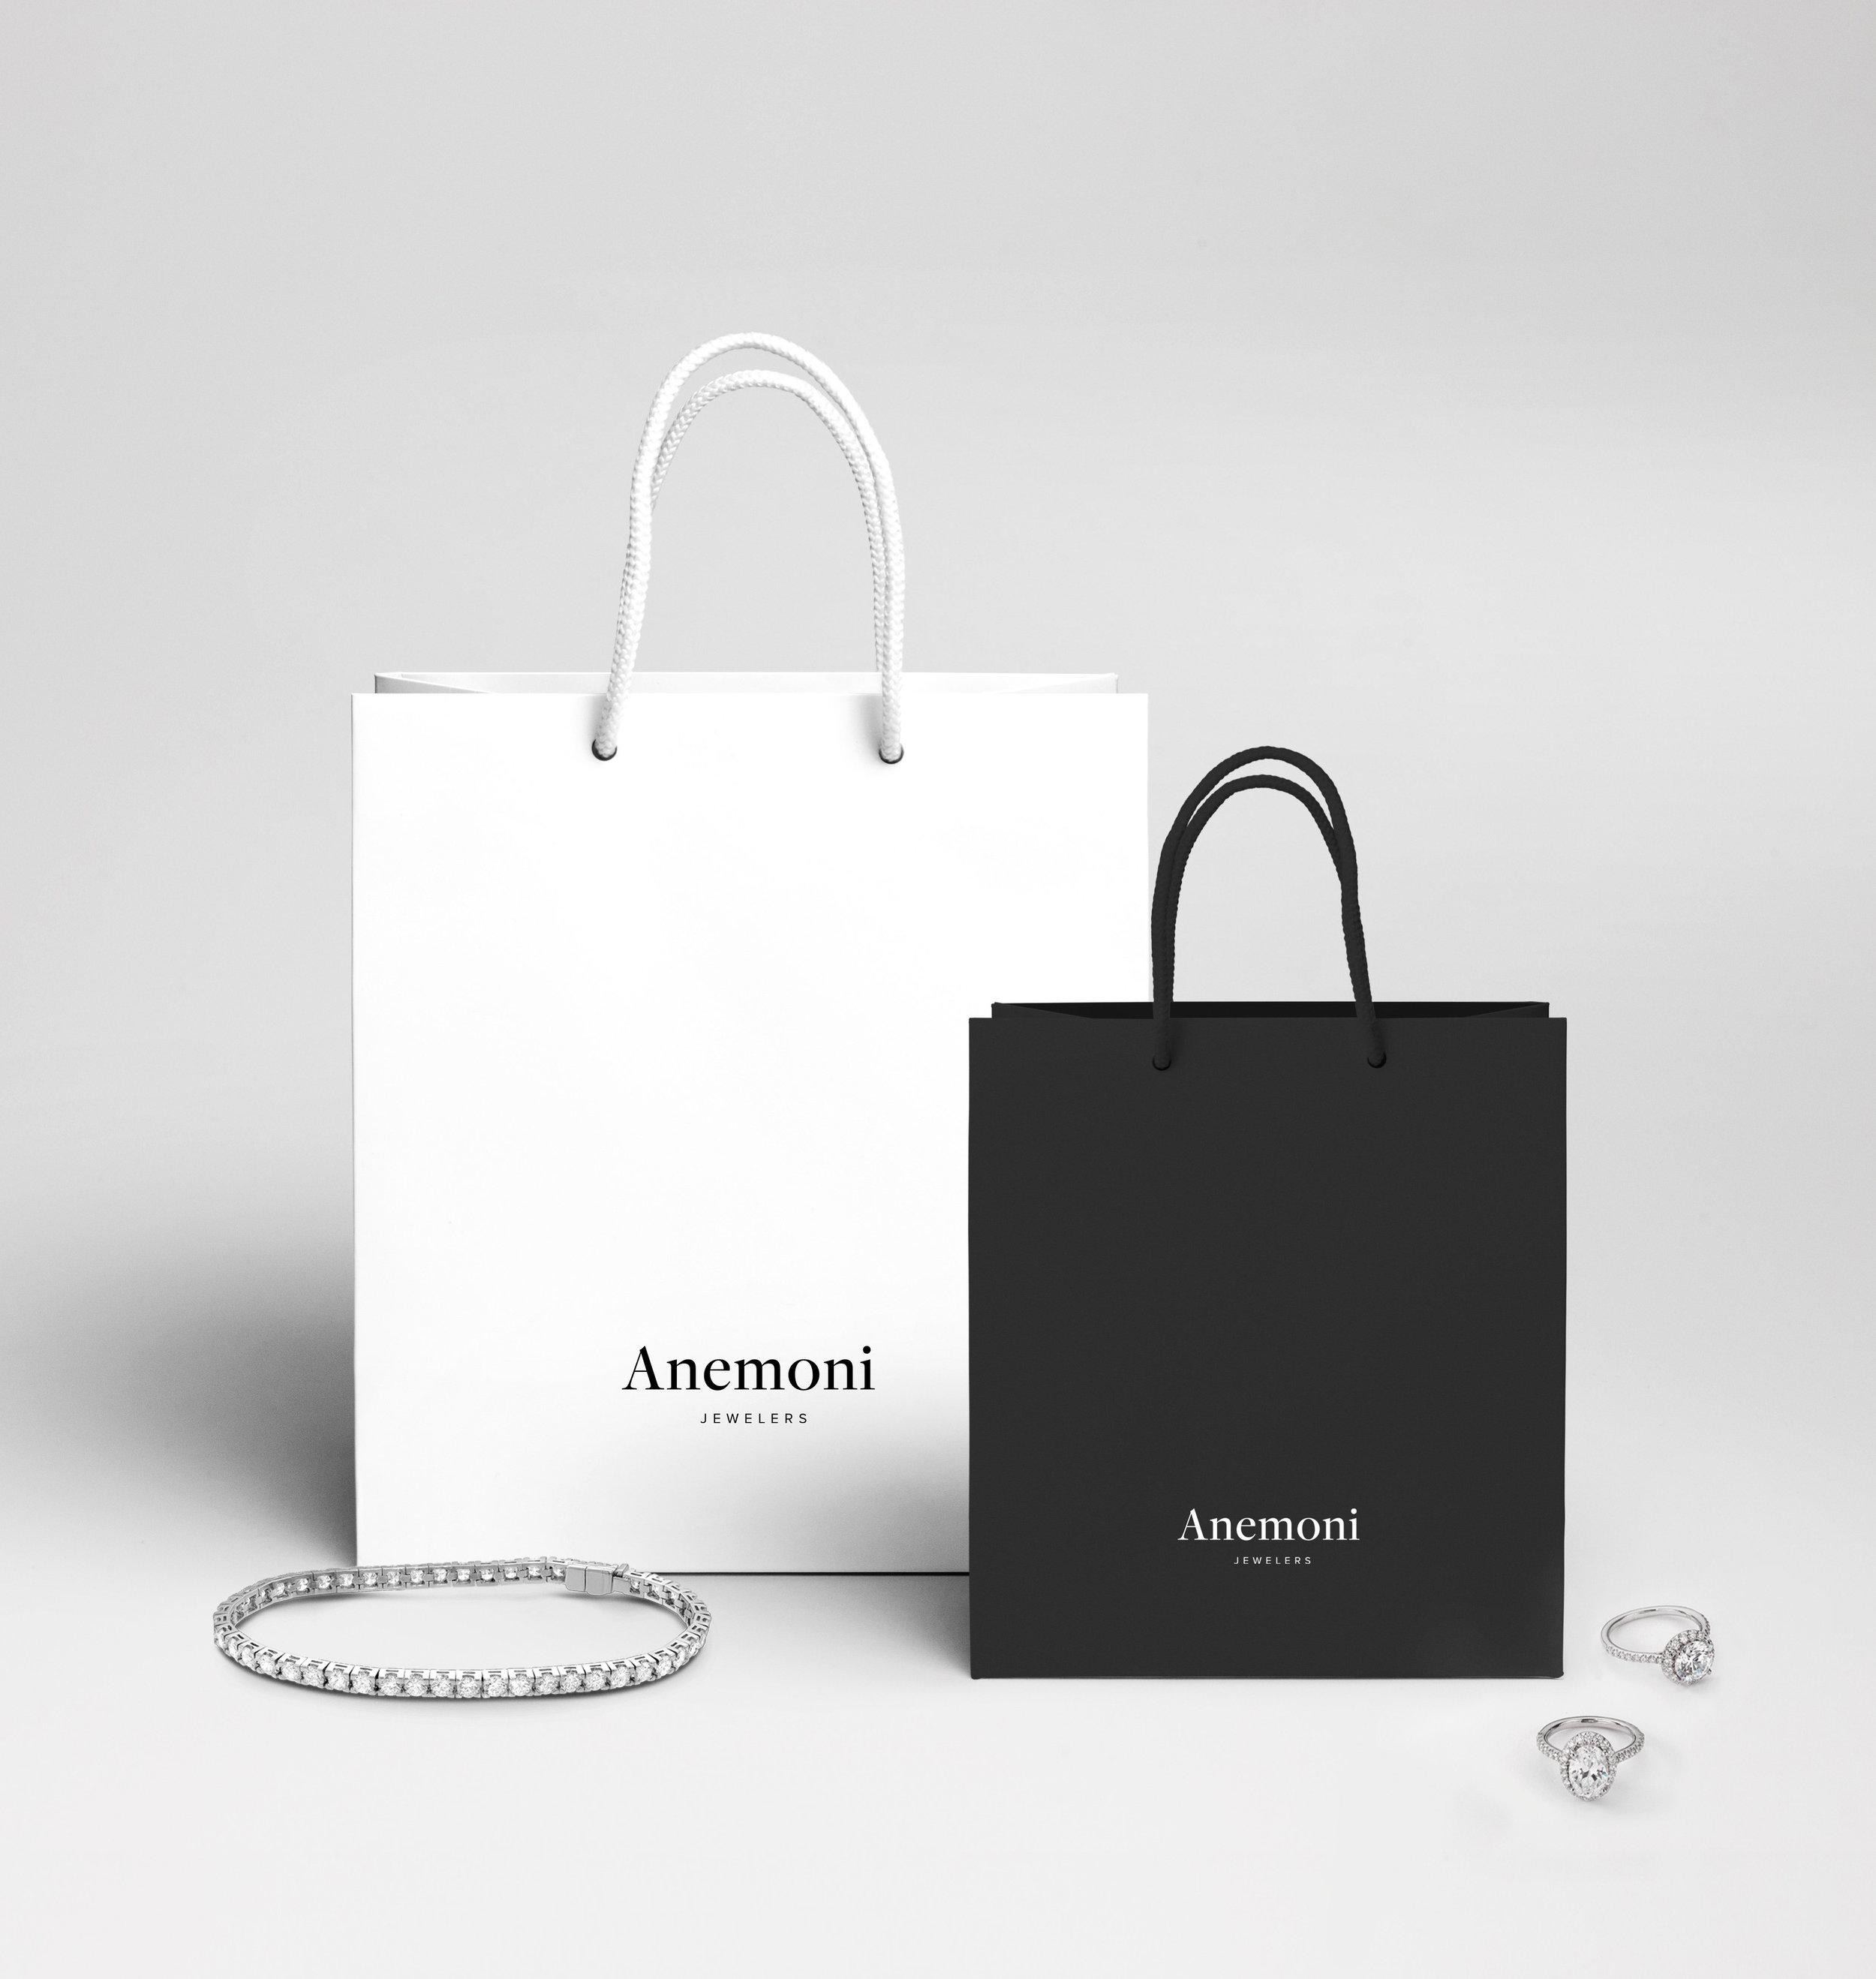 Artful-Union-Anemoni-Jewelers-Black-Bag-White-shopping-Bag-Final.jpg